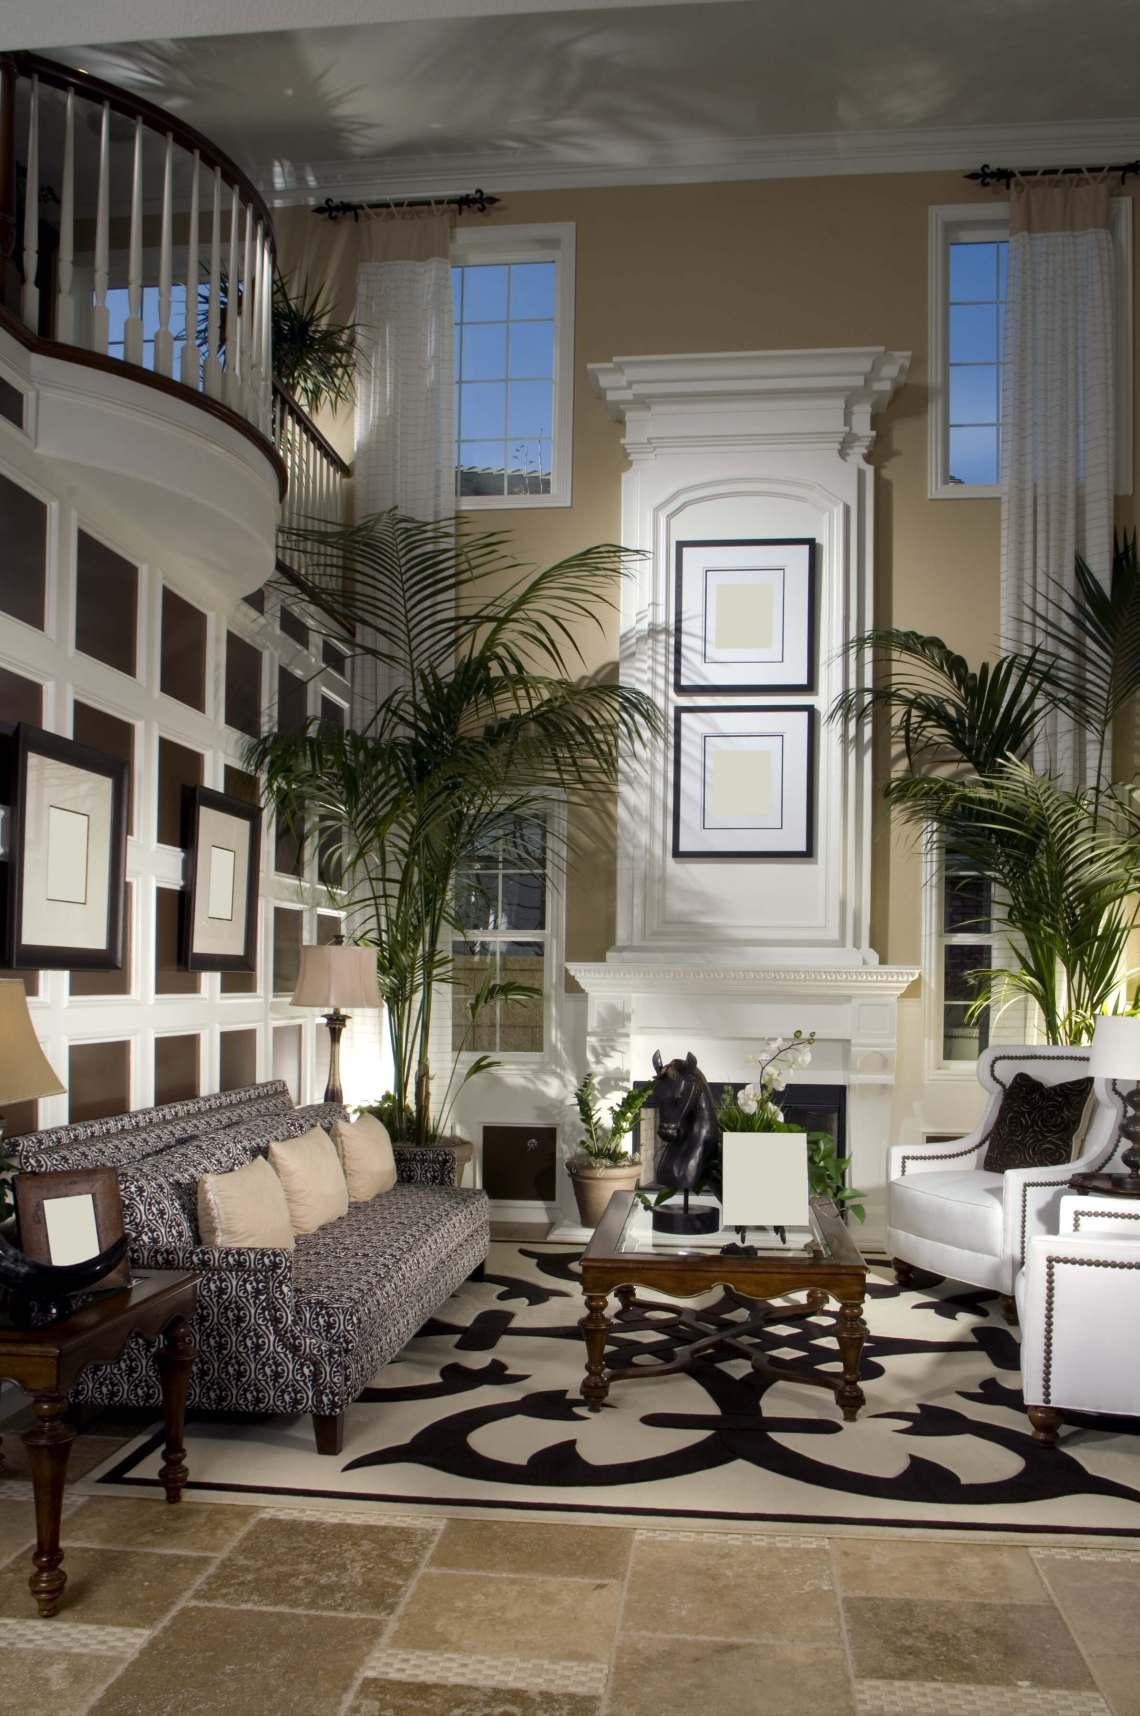 27 Awesome Big Living Room Design Ideas - Decoration Love